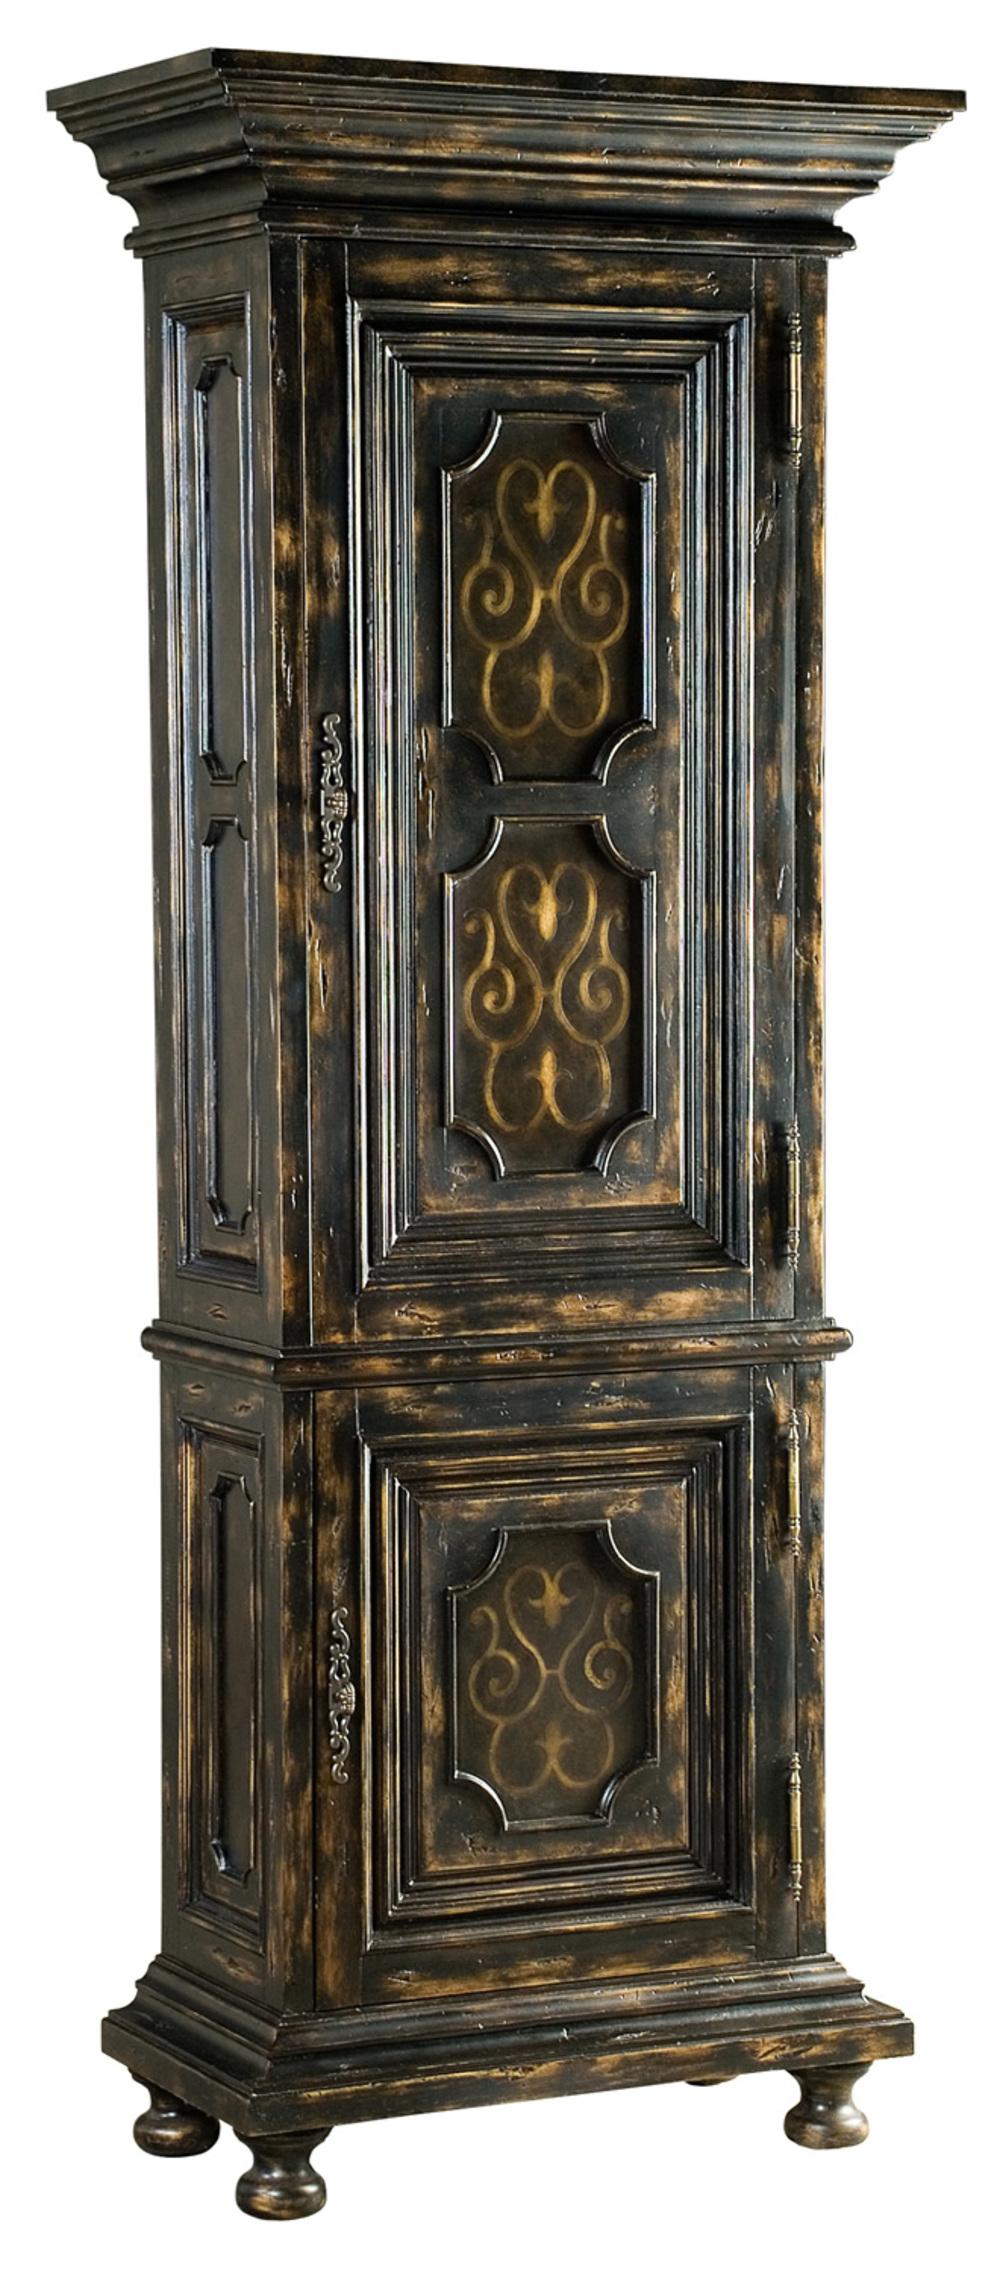 Ambella Home Collection - Sedona Small Cabinet